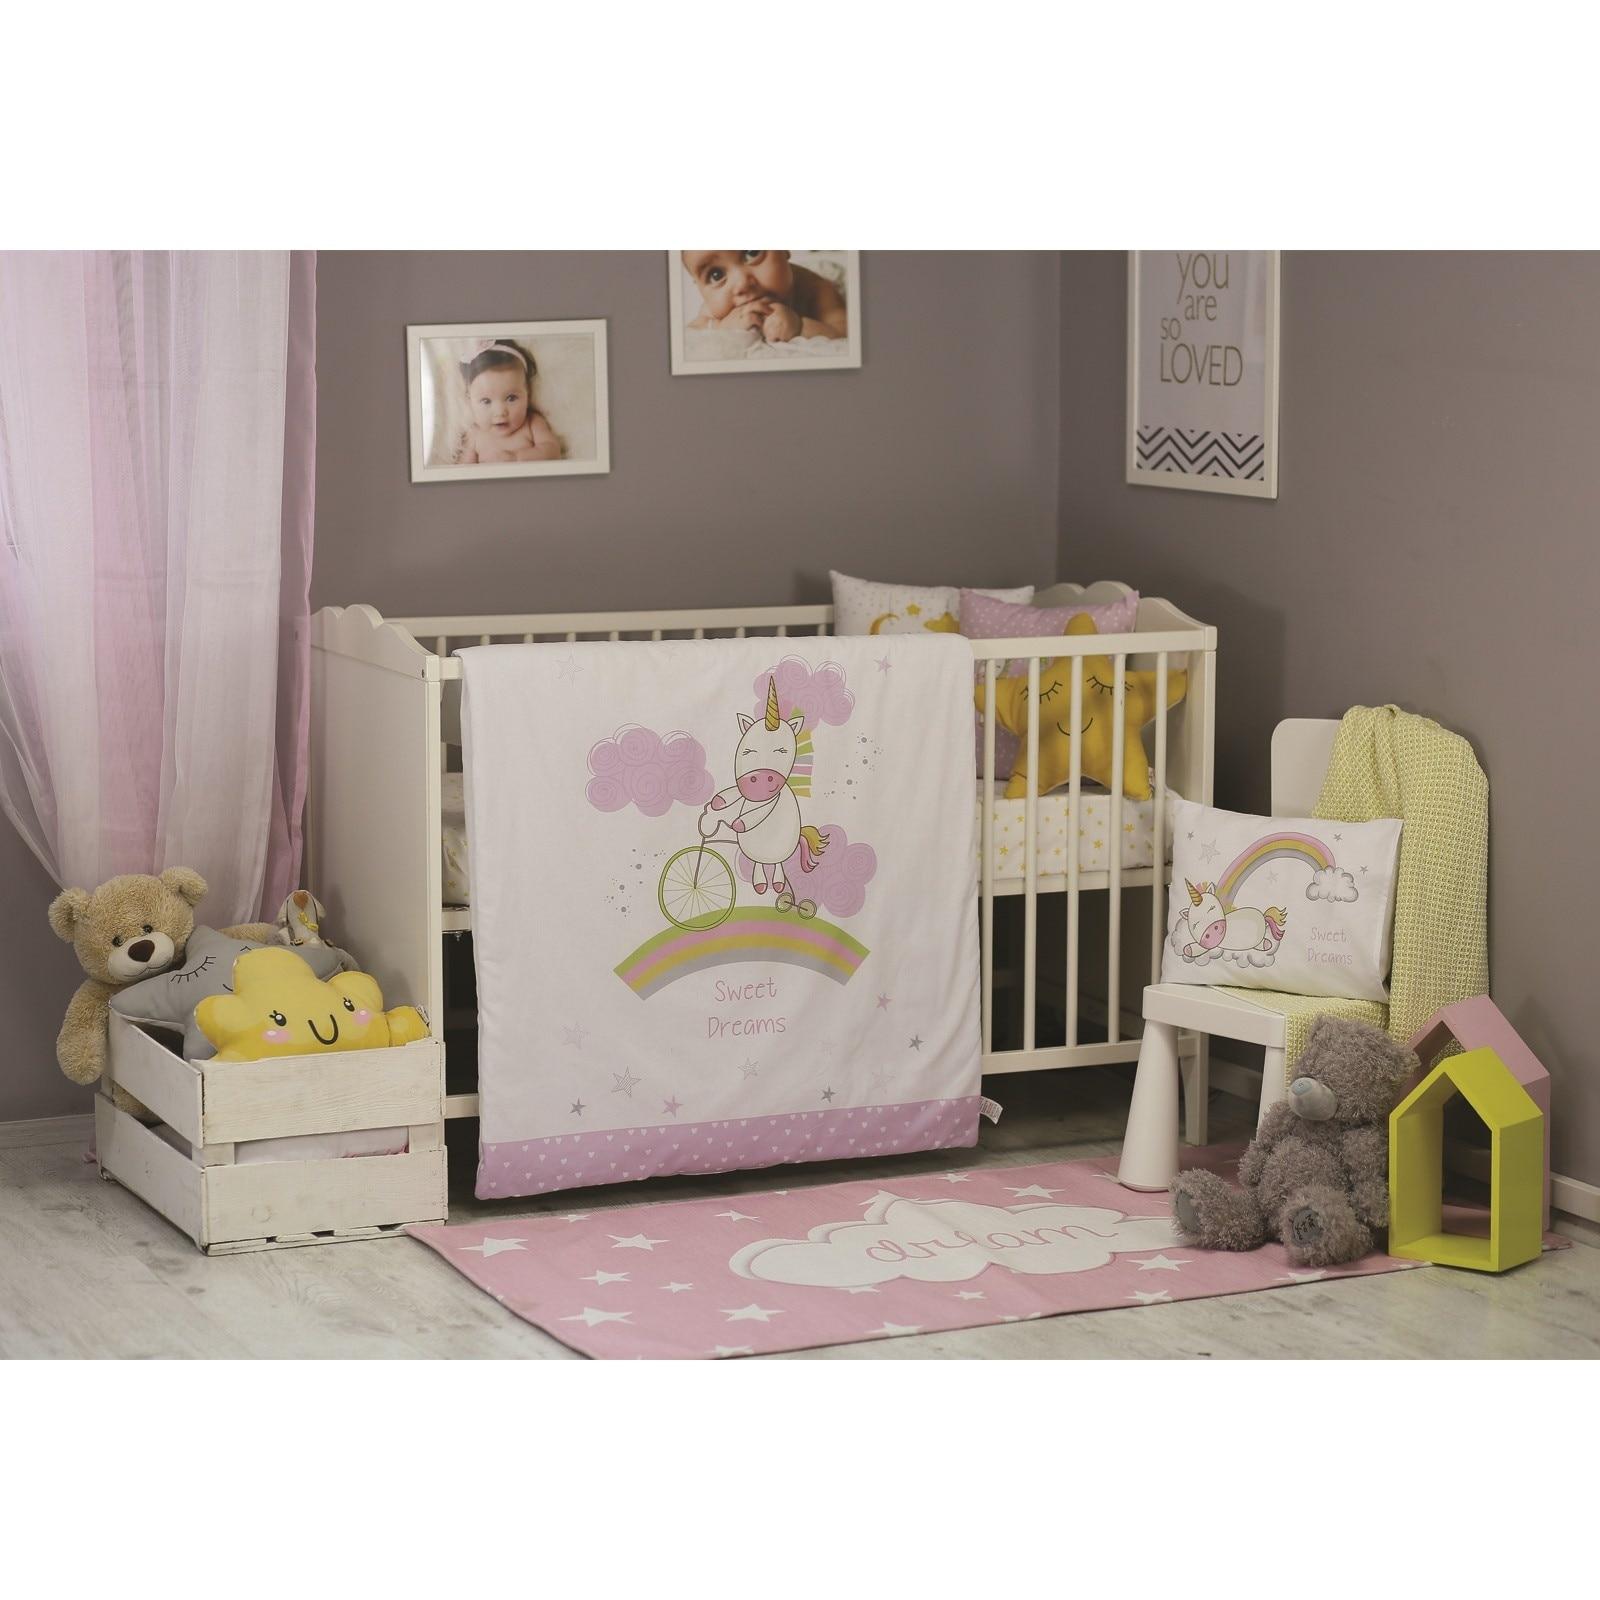 Ebebek Apolena Baby Unicorn Travel Cot Bed Sleep Cover 5 Pcs Set